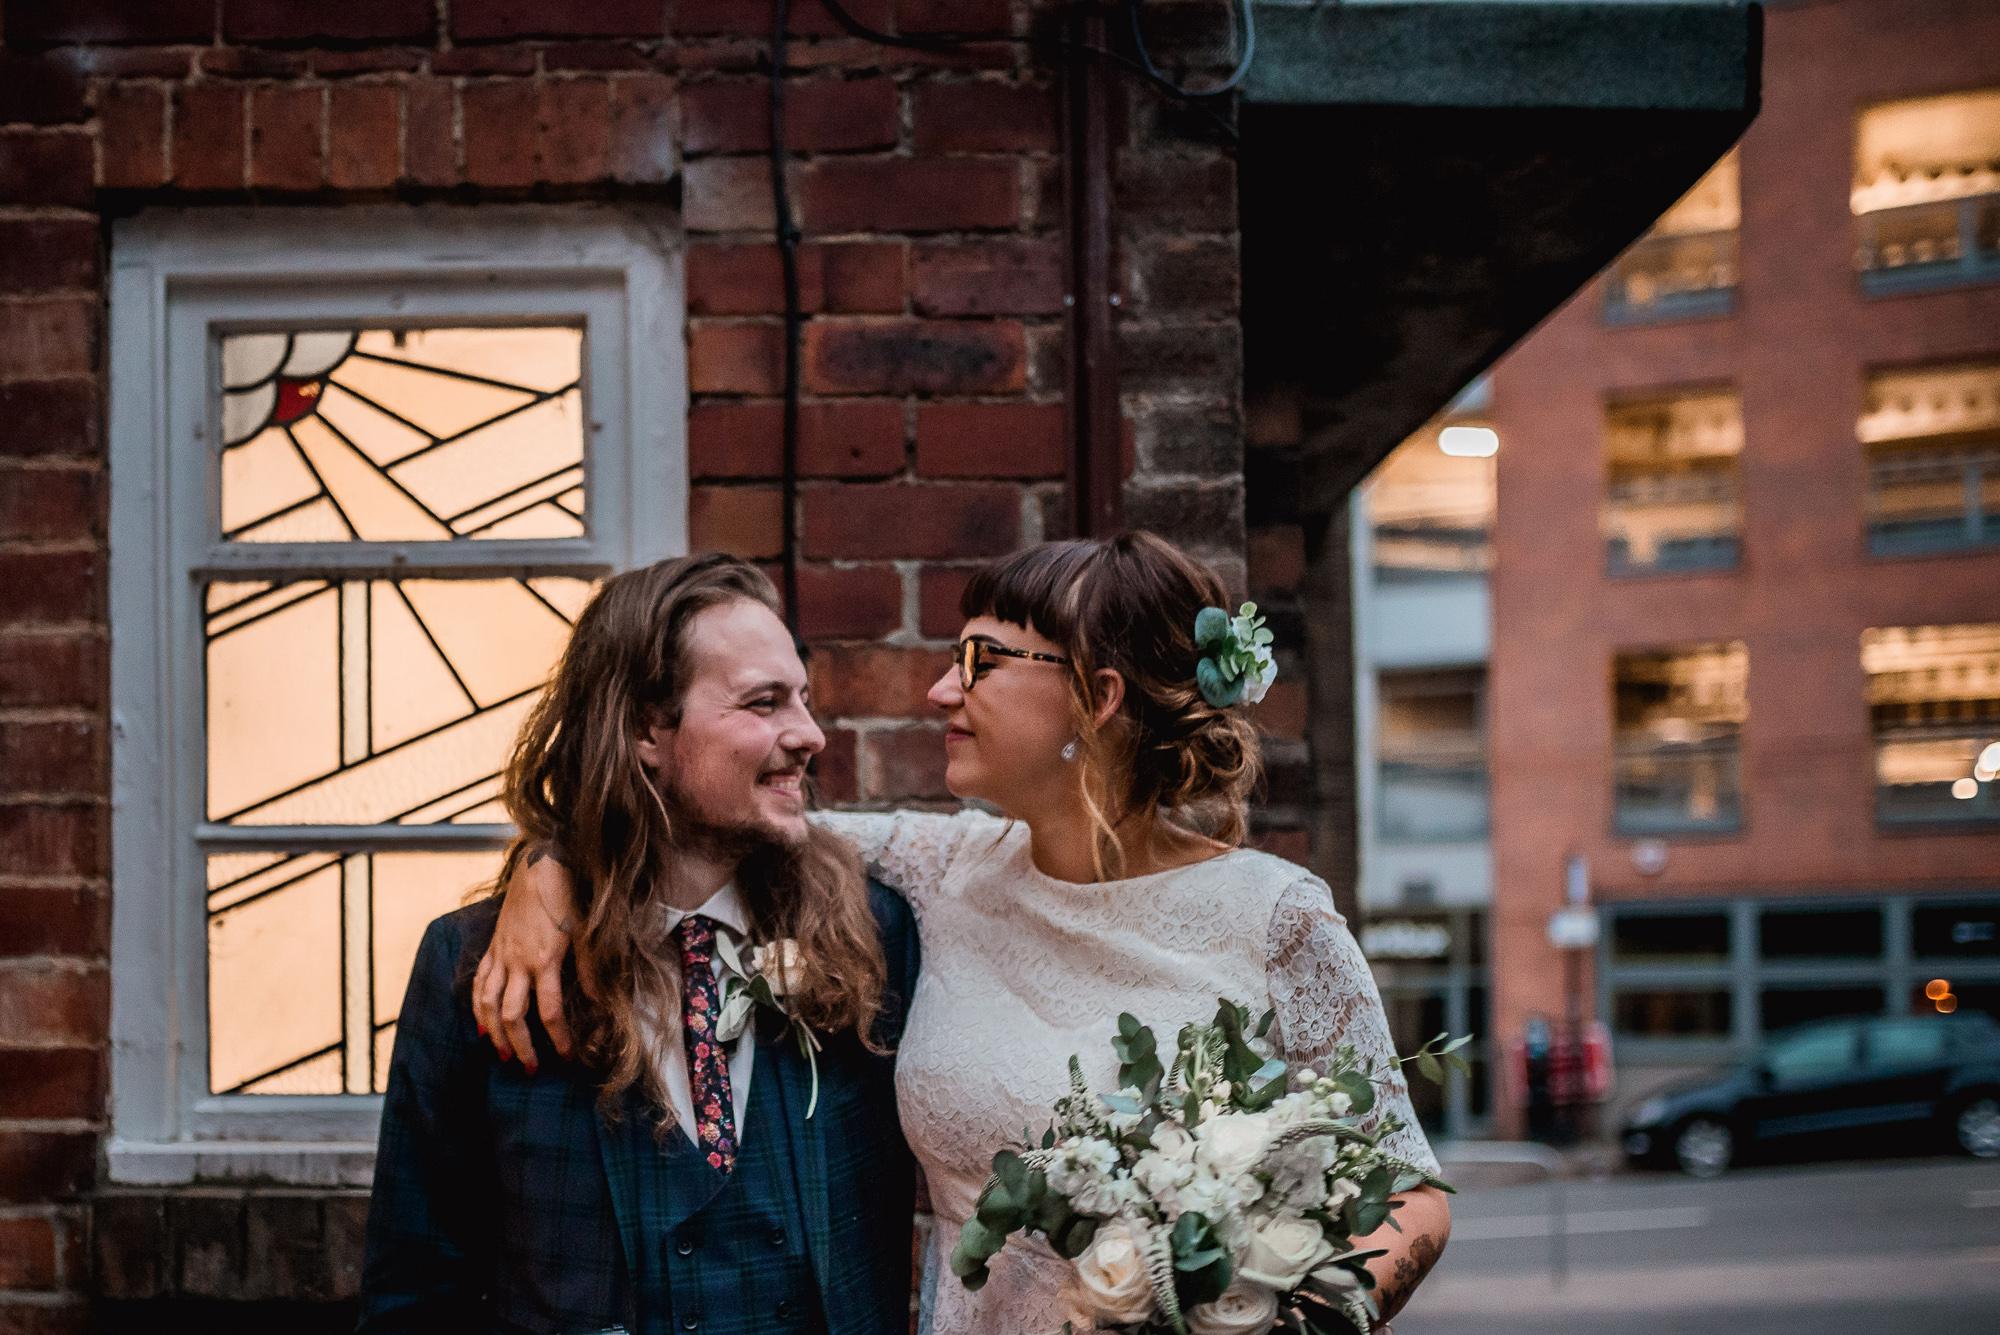 Harriet-Dahlia-Bespoke-Lace-Silk-Bohemian-Wedding-Dress-Sleeves-Tattooed-Bride-Alternative-Wedding-Sheffield-40.jpg